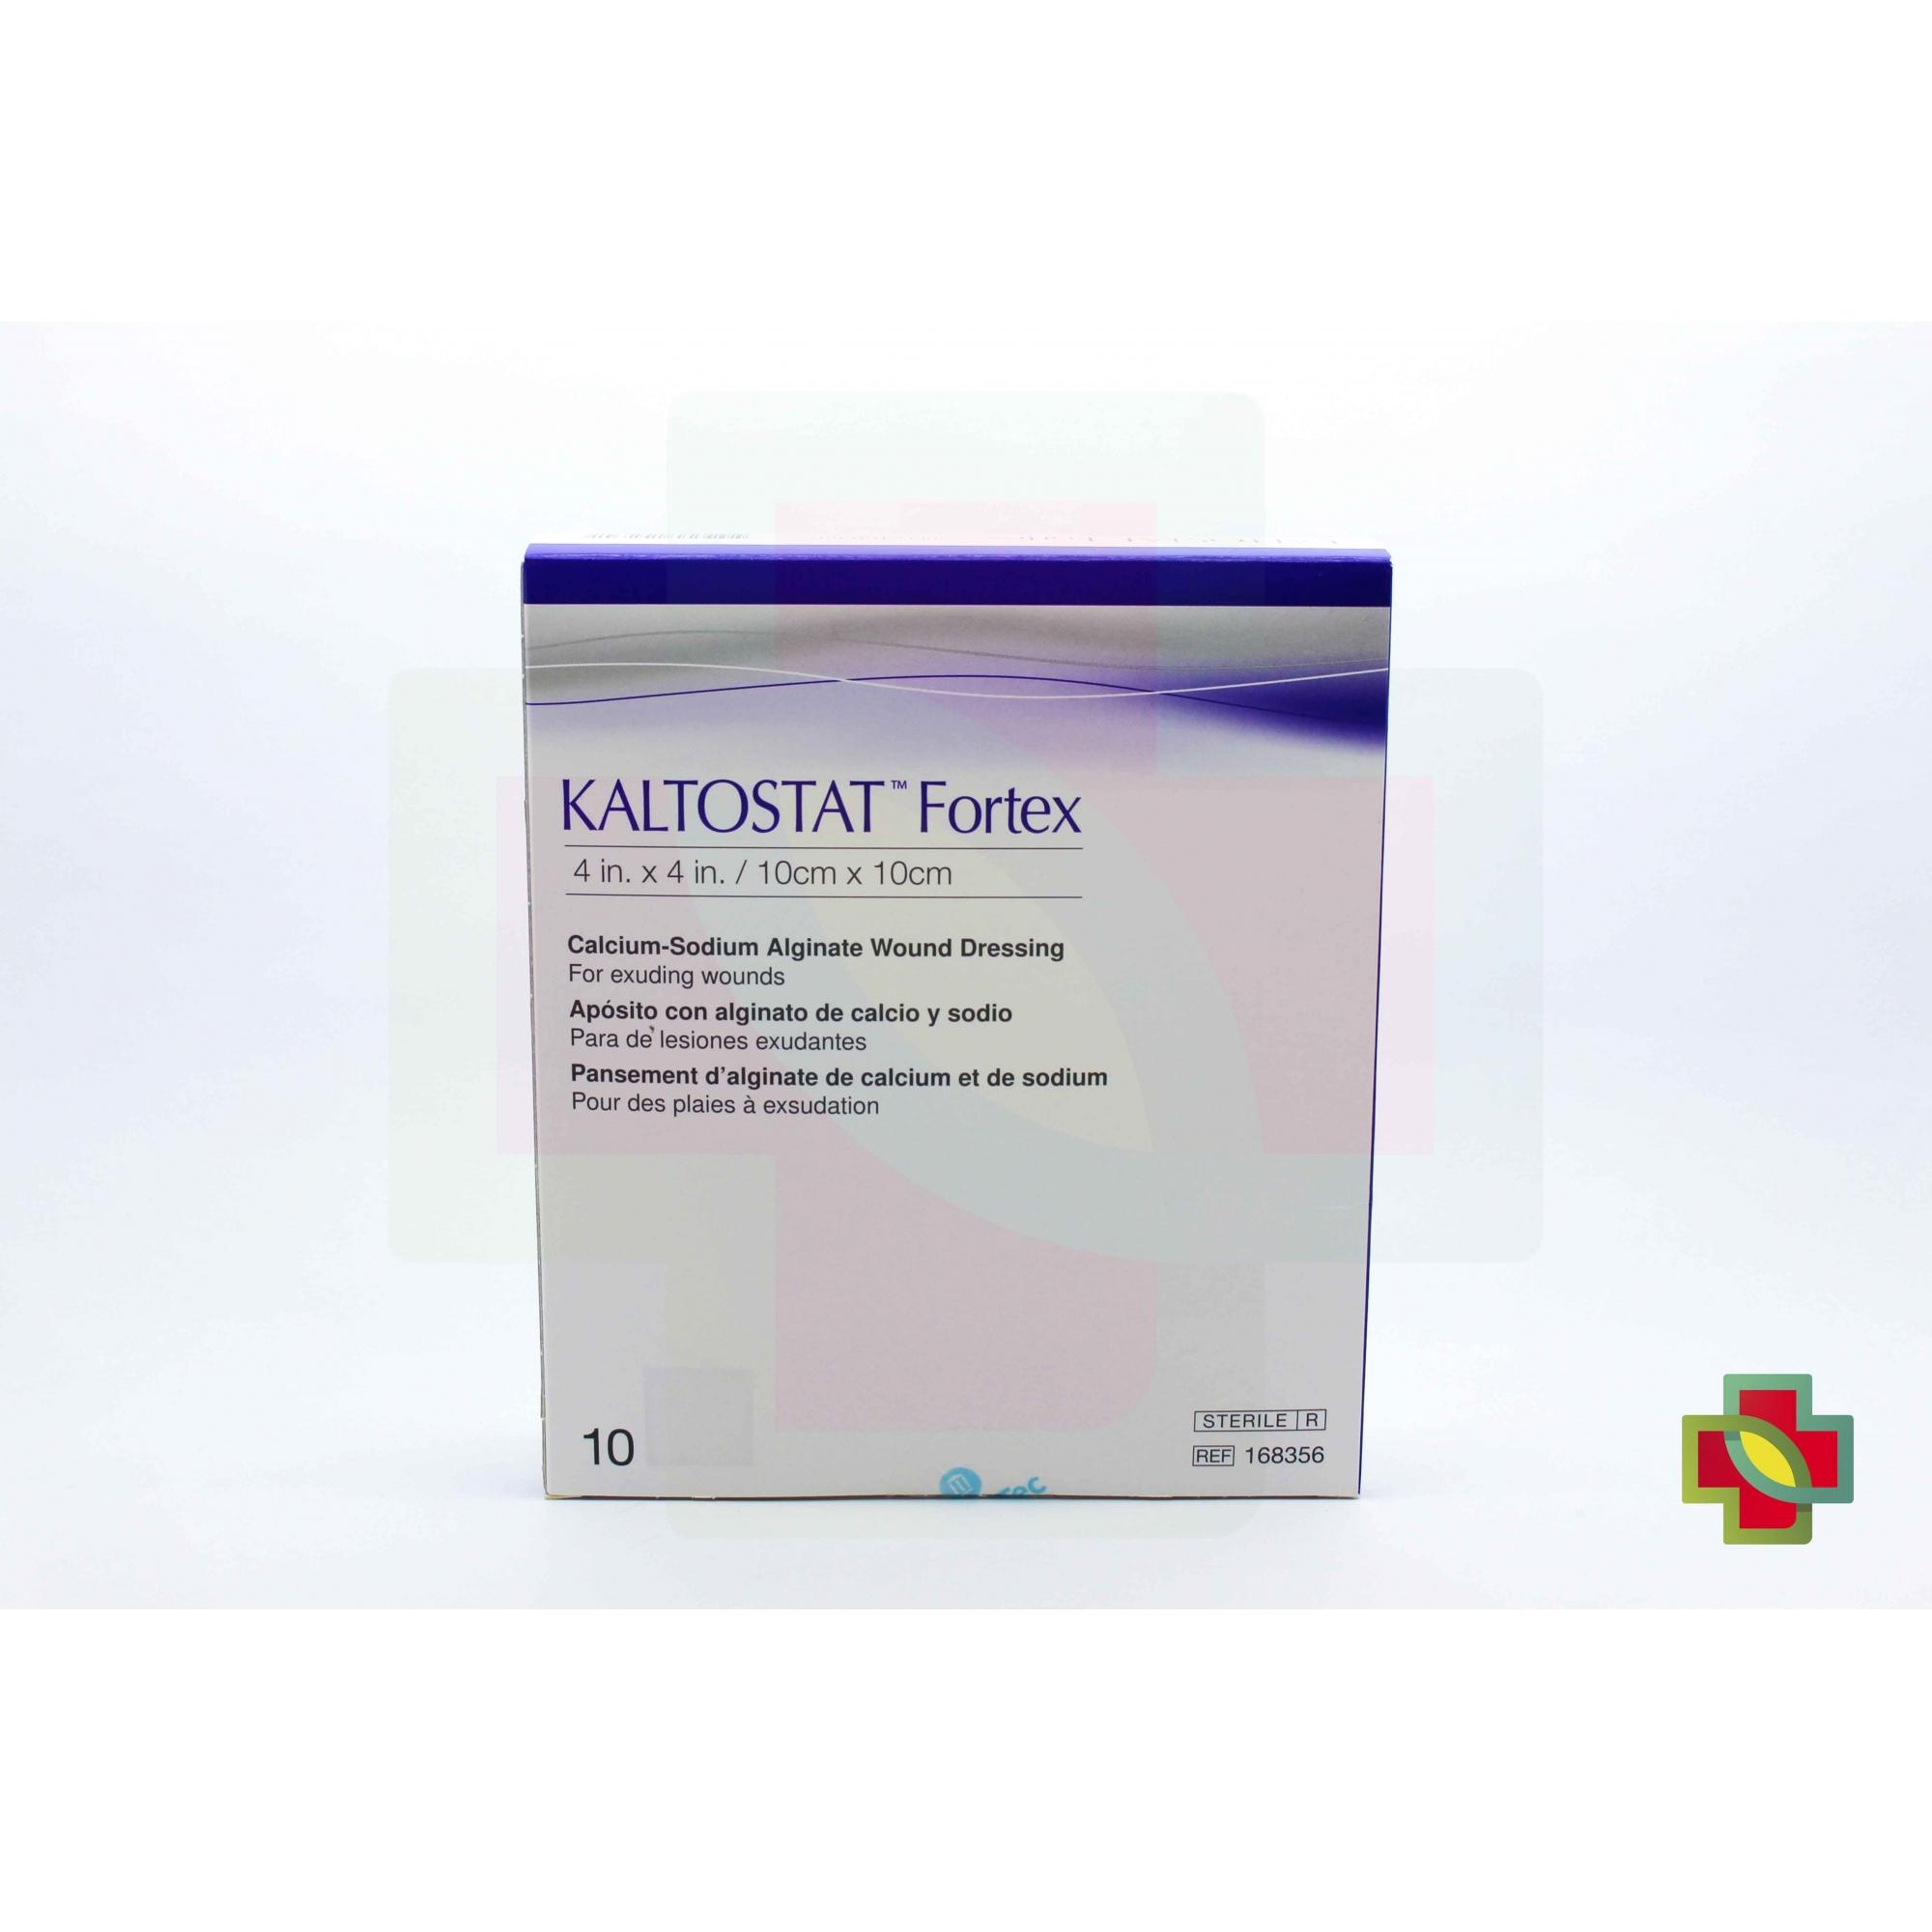 CURATIVO KALTOSTAT FORTEX 10 X 10 CM (C/10 UNDS) 168356 - CONVATEC